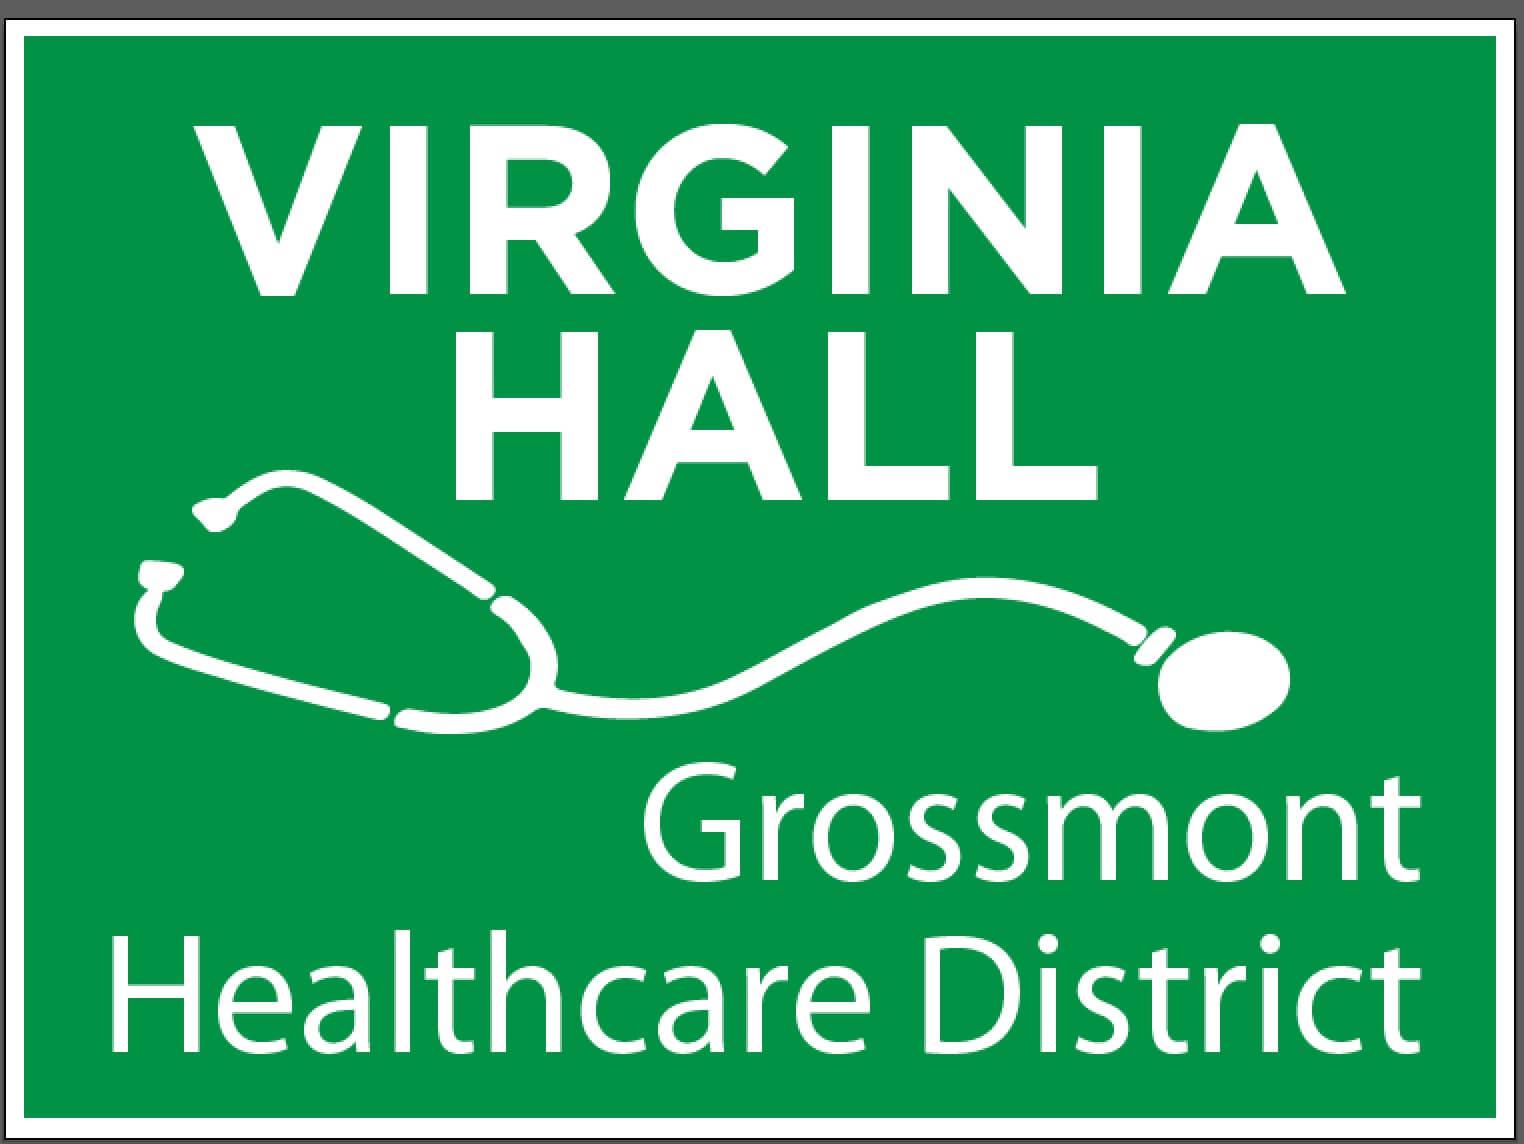 Virginia Hall for Grossmont Health Care